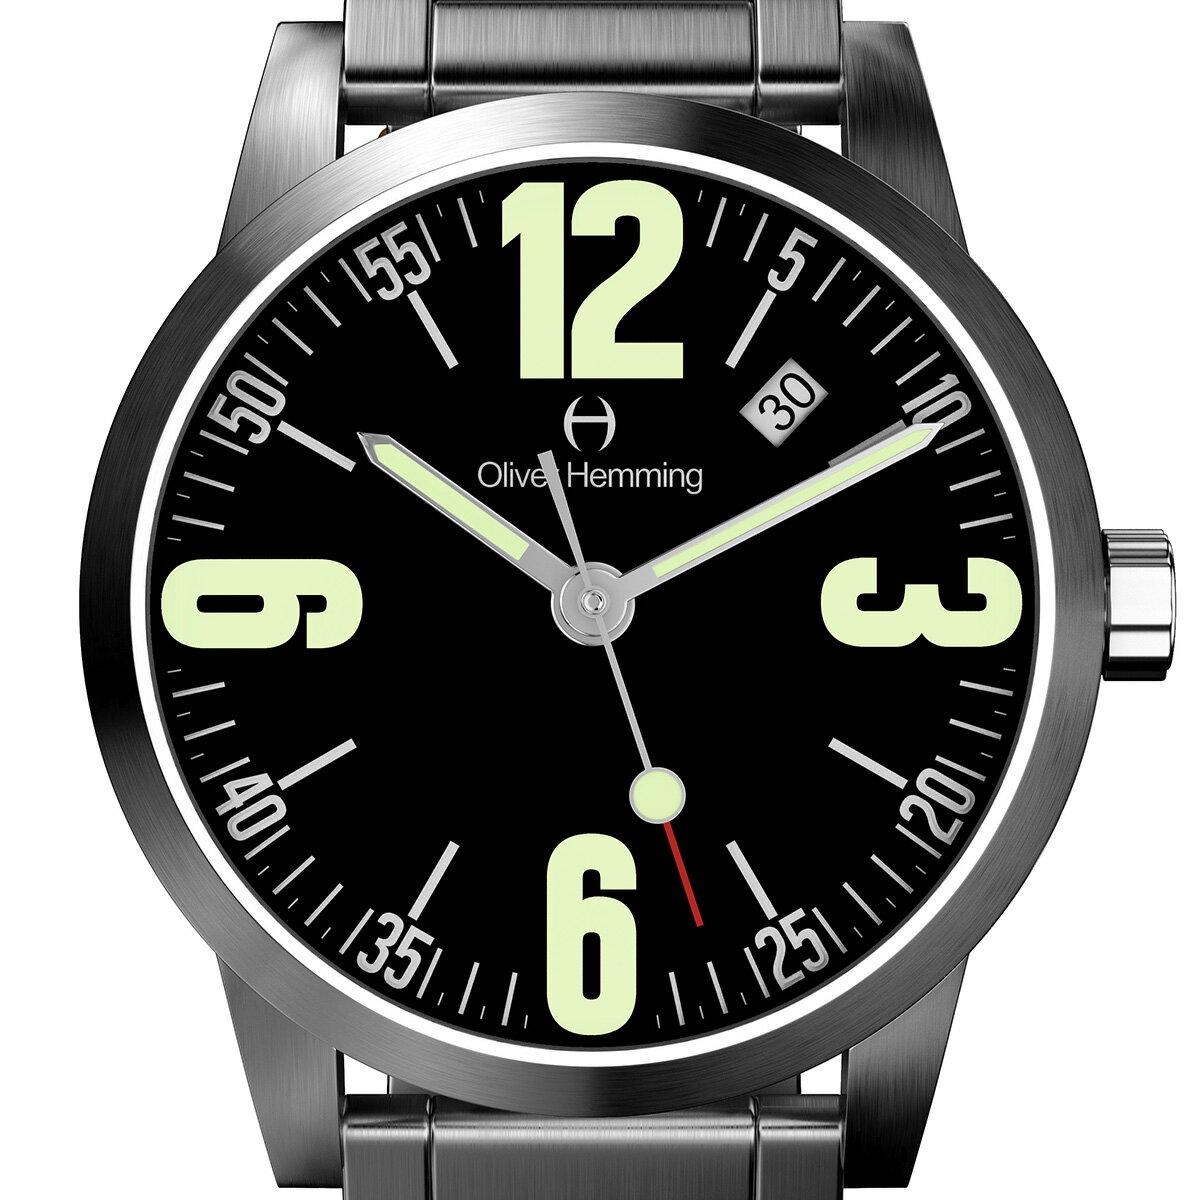 Oliver Hemming オリバーヘミング クォーツ 腕時計 イギリス アート デザイン [WT17SB66BCDSB] 並行輸入品 純正ケース メーカー保証【新生活応援】 メンズウォッチ イギリス 海外 輸入時計 腕時計/夜行表示/防水機能 防水時計小さな